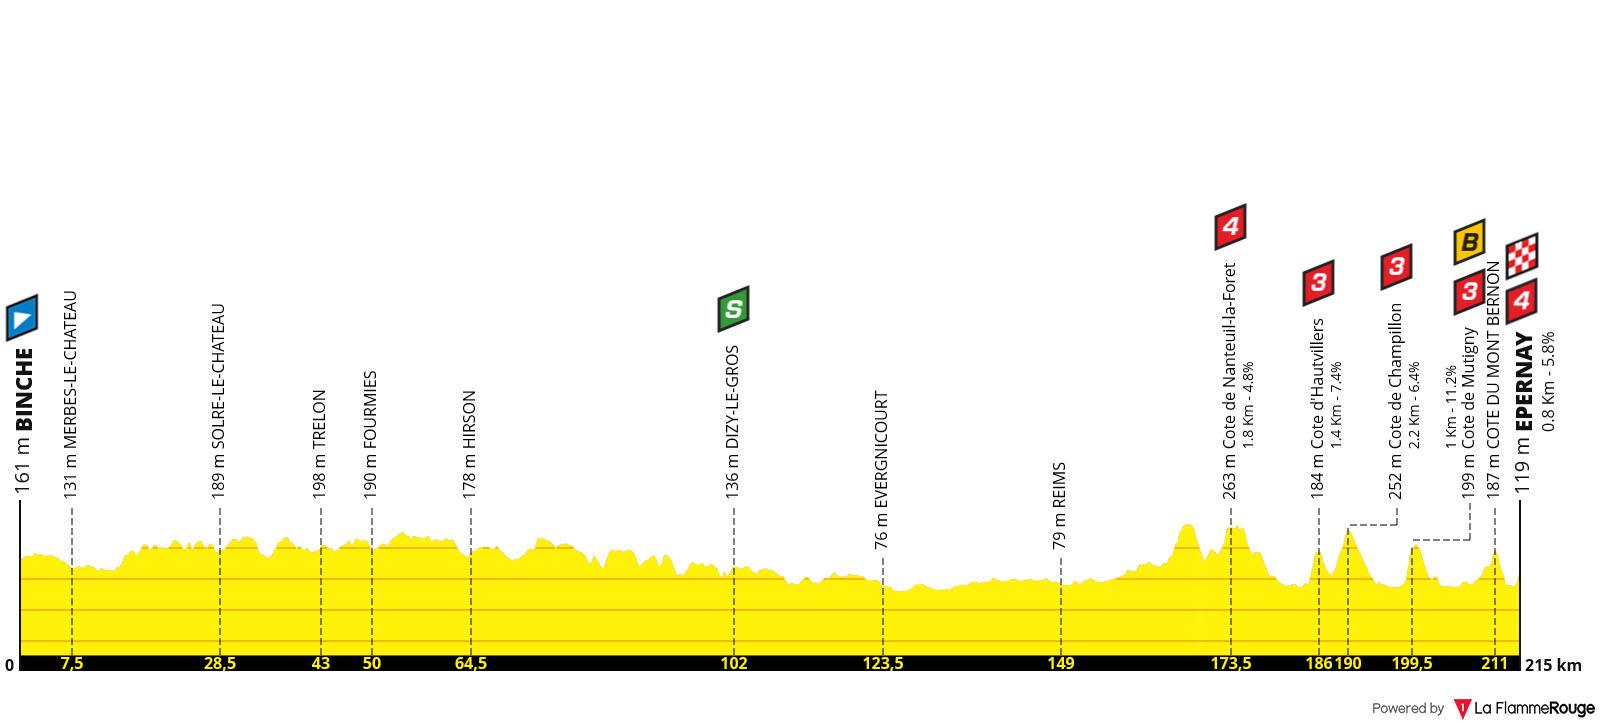 Perfil Etapa 03 - Tour de Francia 2019